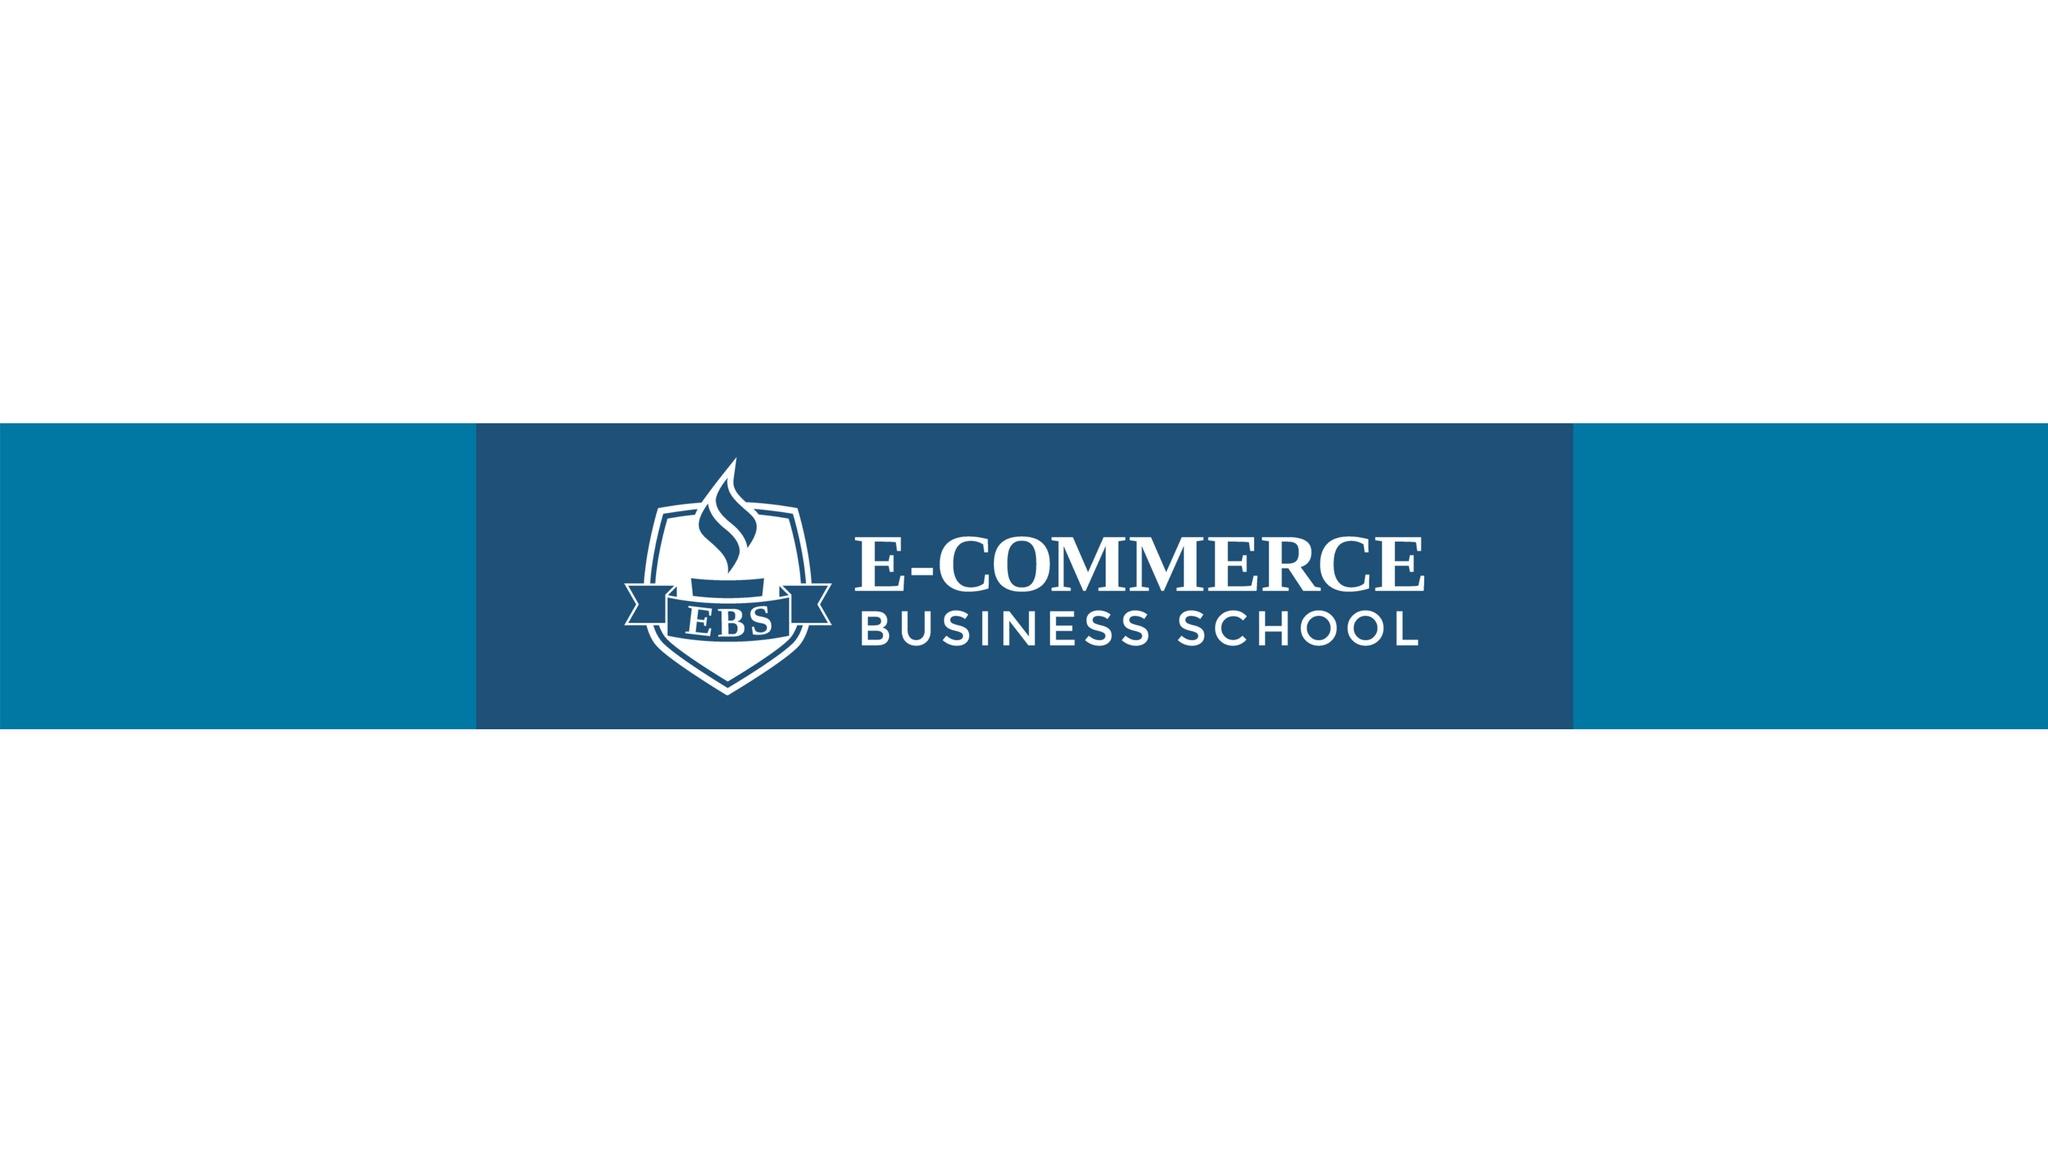 E-Commerce Business School- eCommerce Youtube Channels 2021